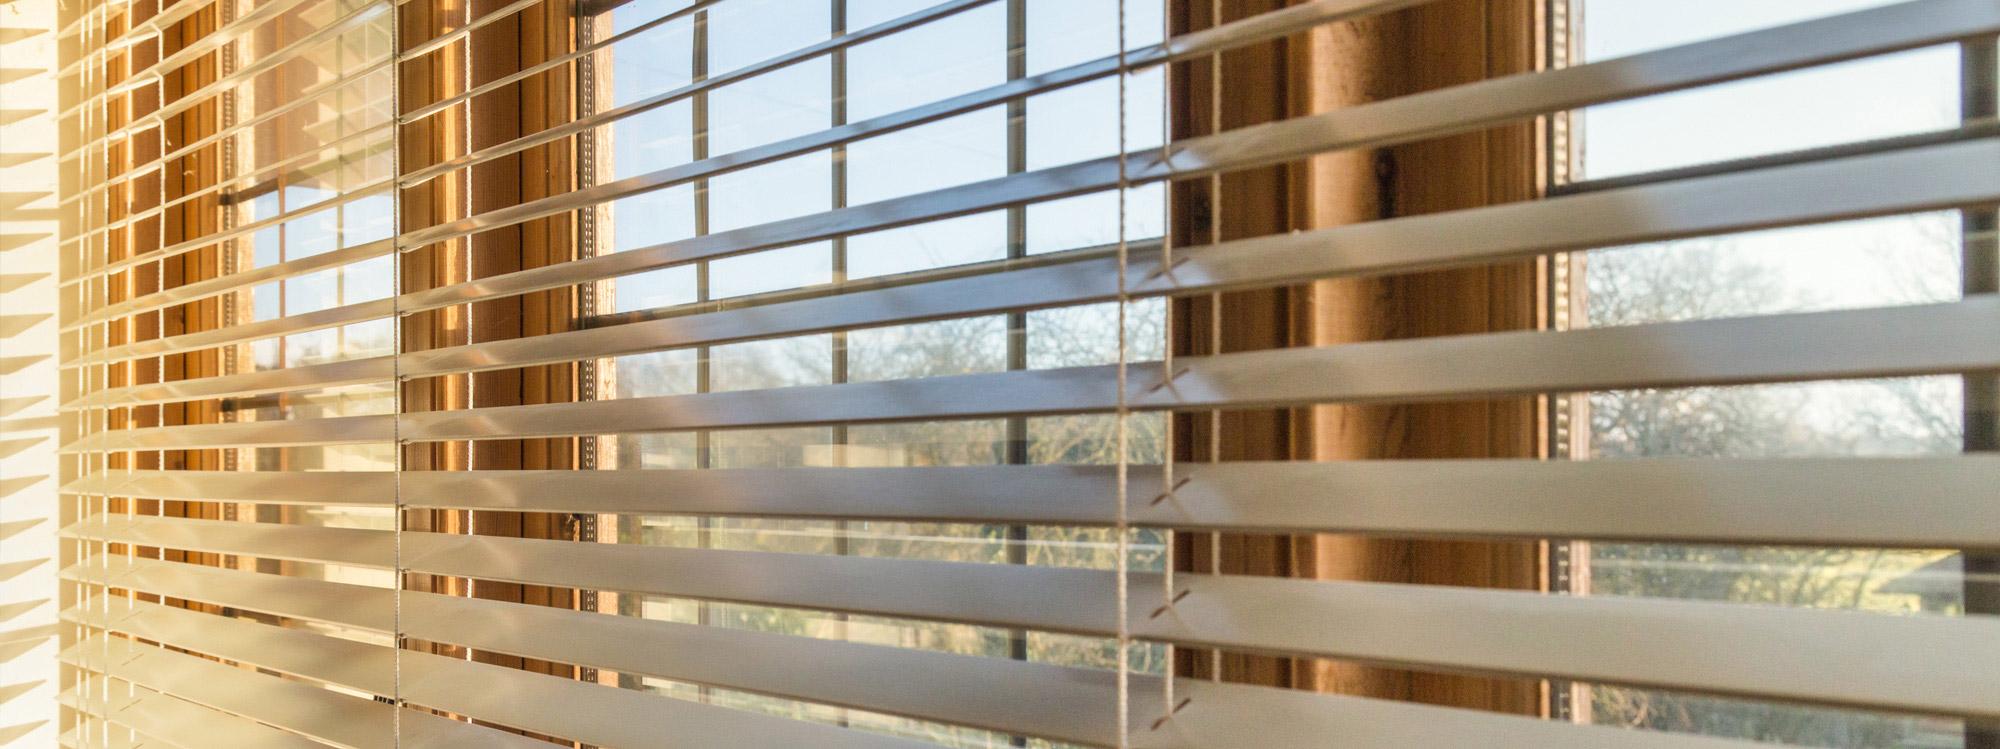 Persienner | Glasmästare | Produkter Glaskedjan